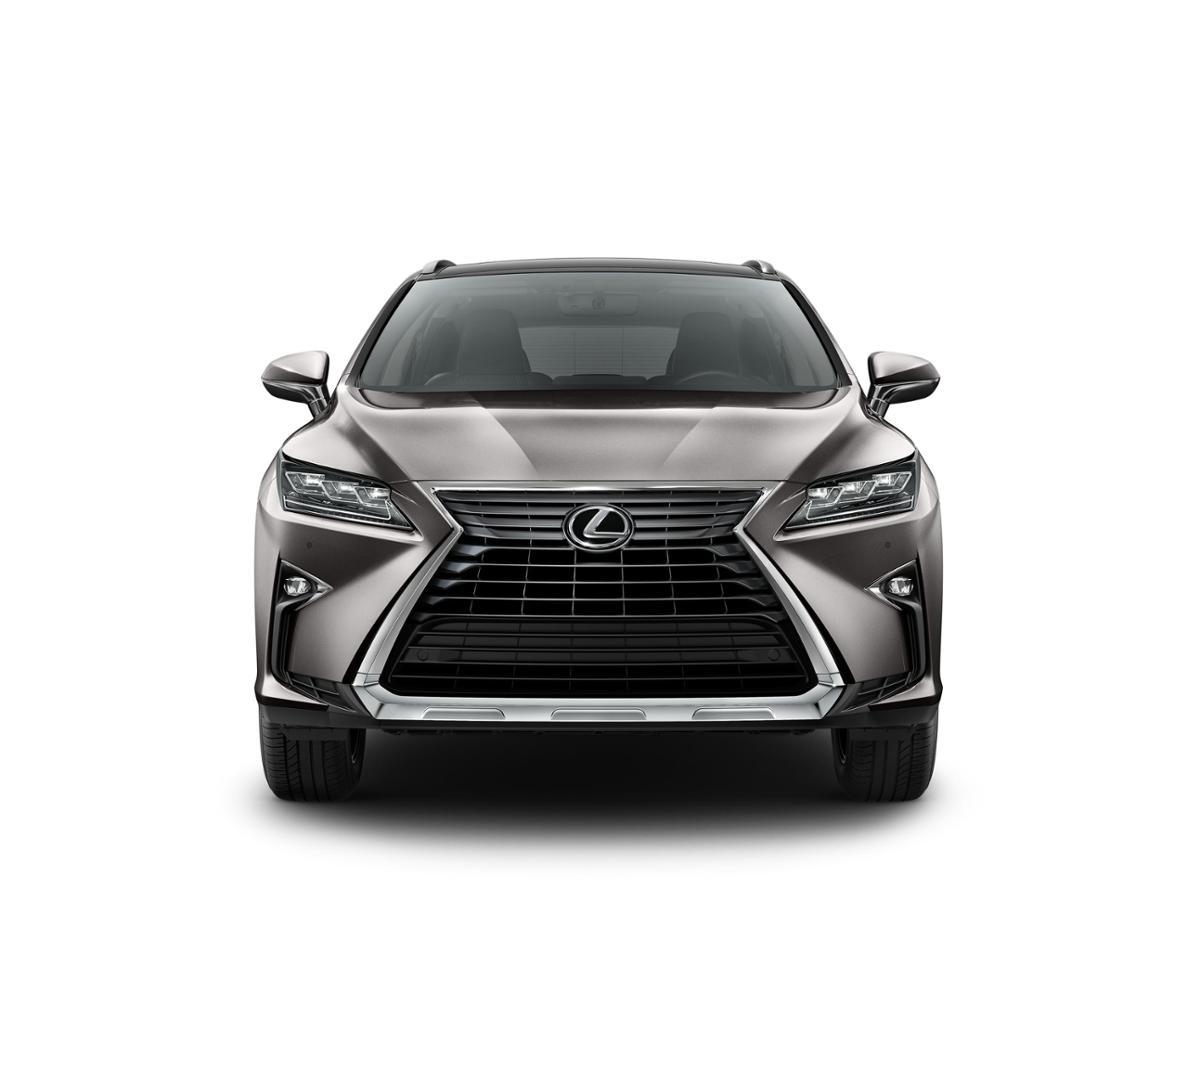 Birmingham Atomic Silver 2019 Lexus RX 350: New Suv For